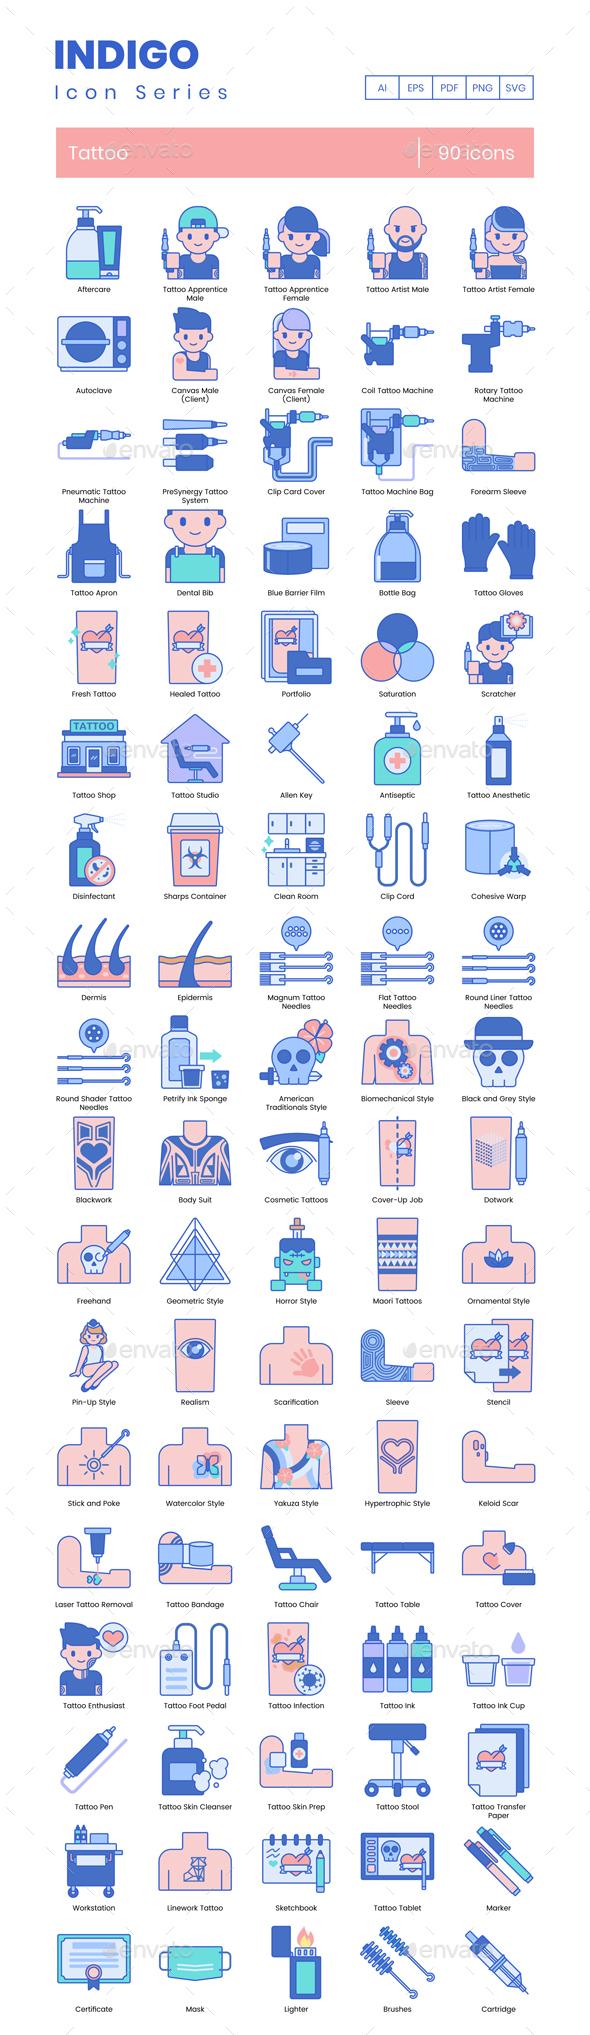 90 Tattoo Icons - Indigo Series